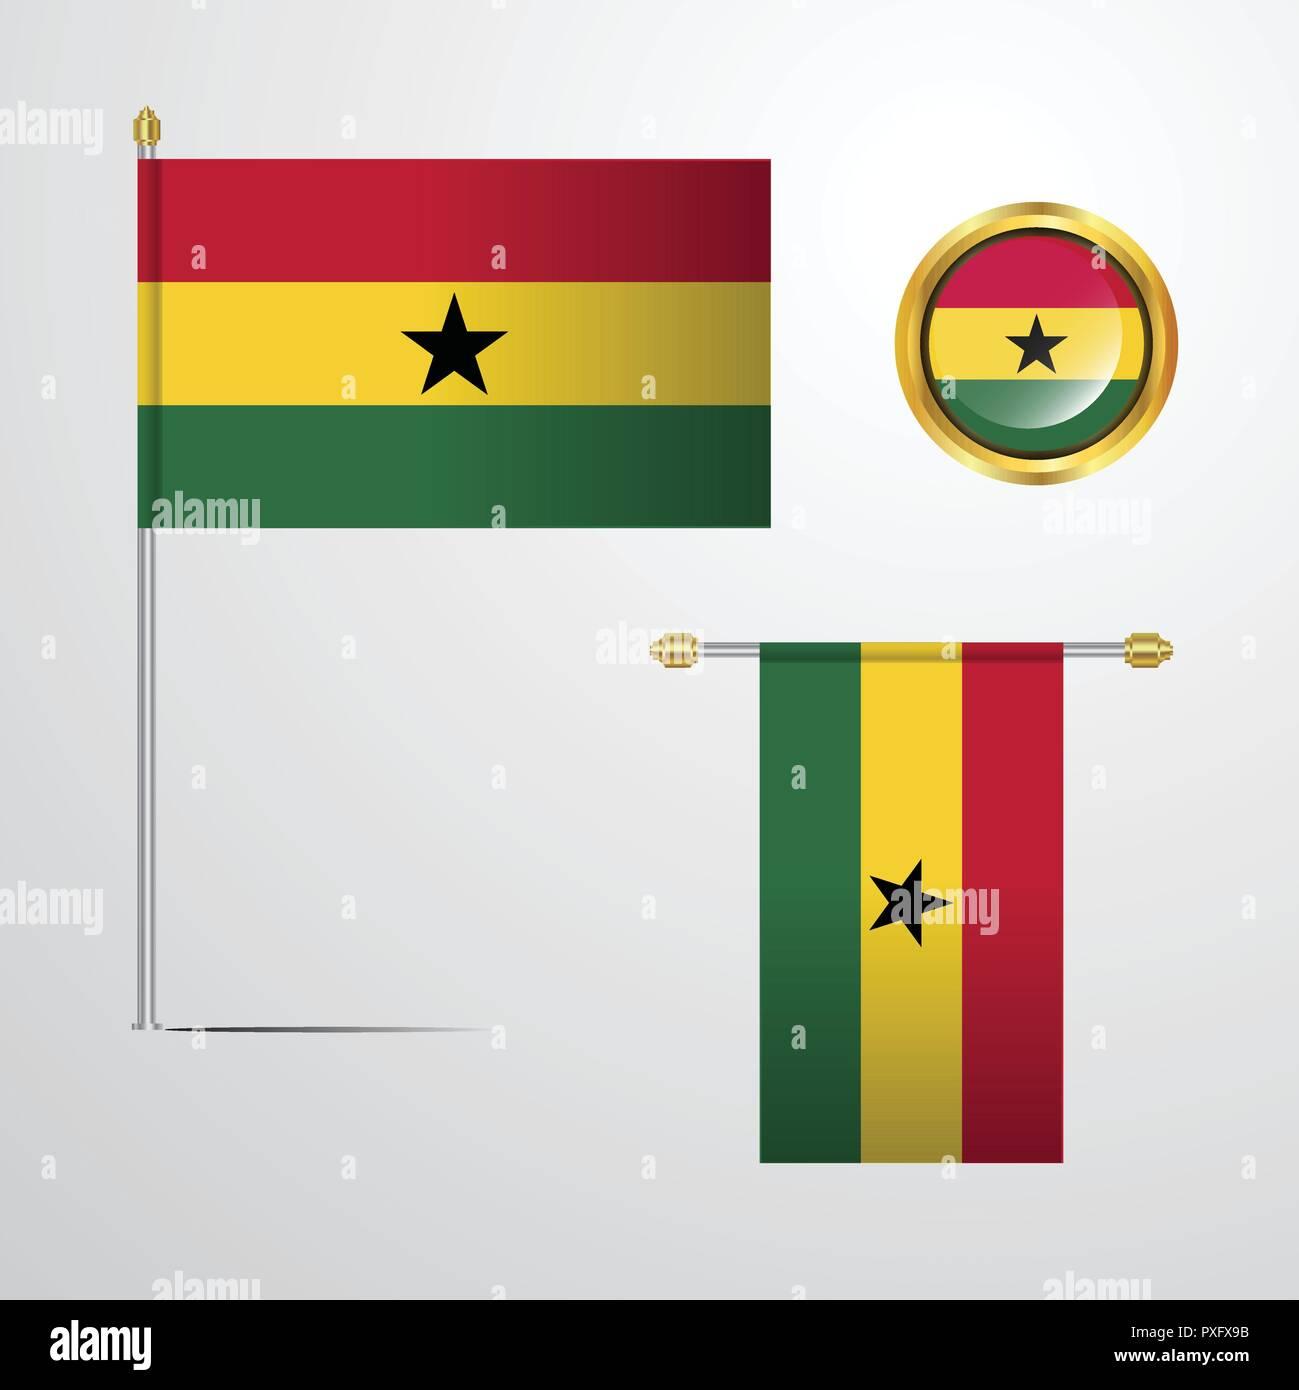 Ghana - Stock Vector